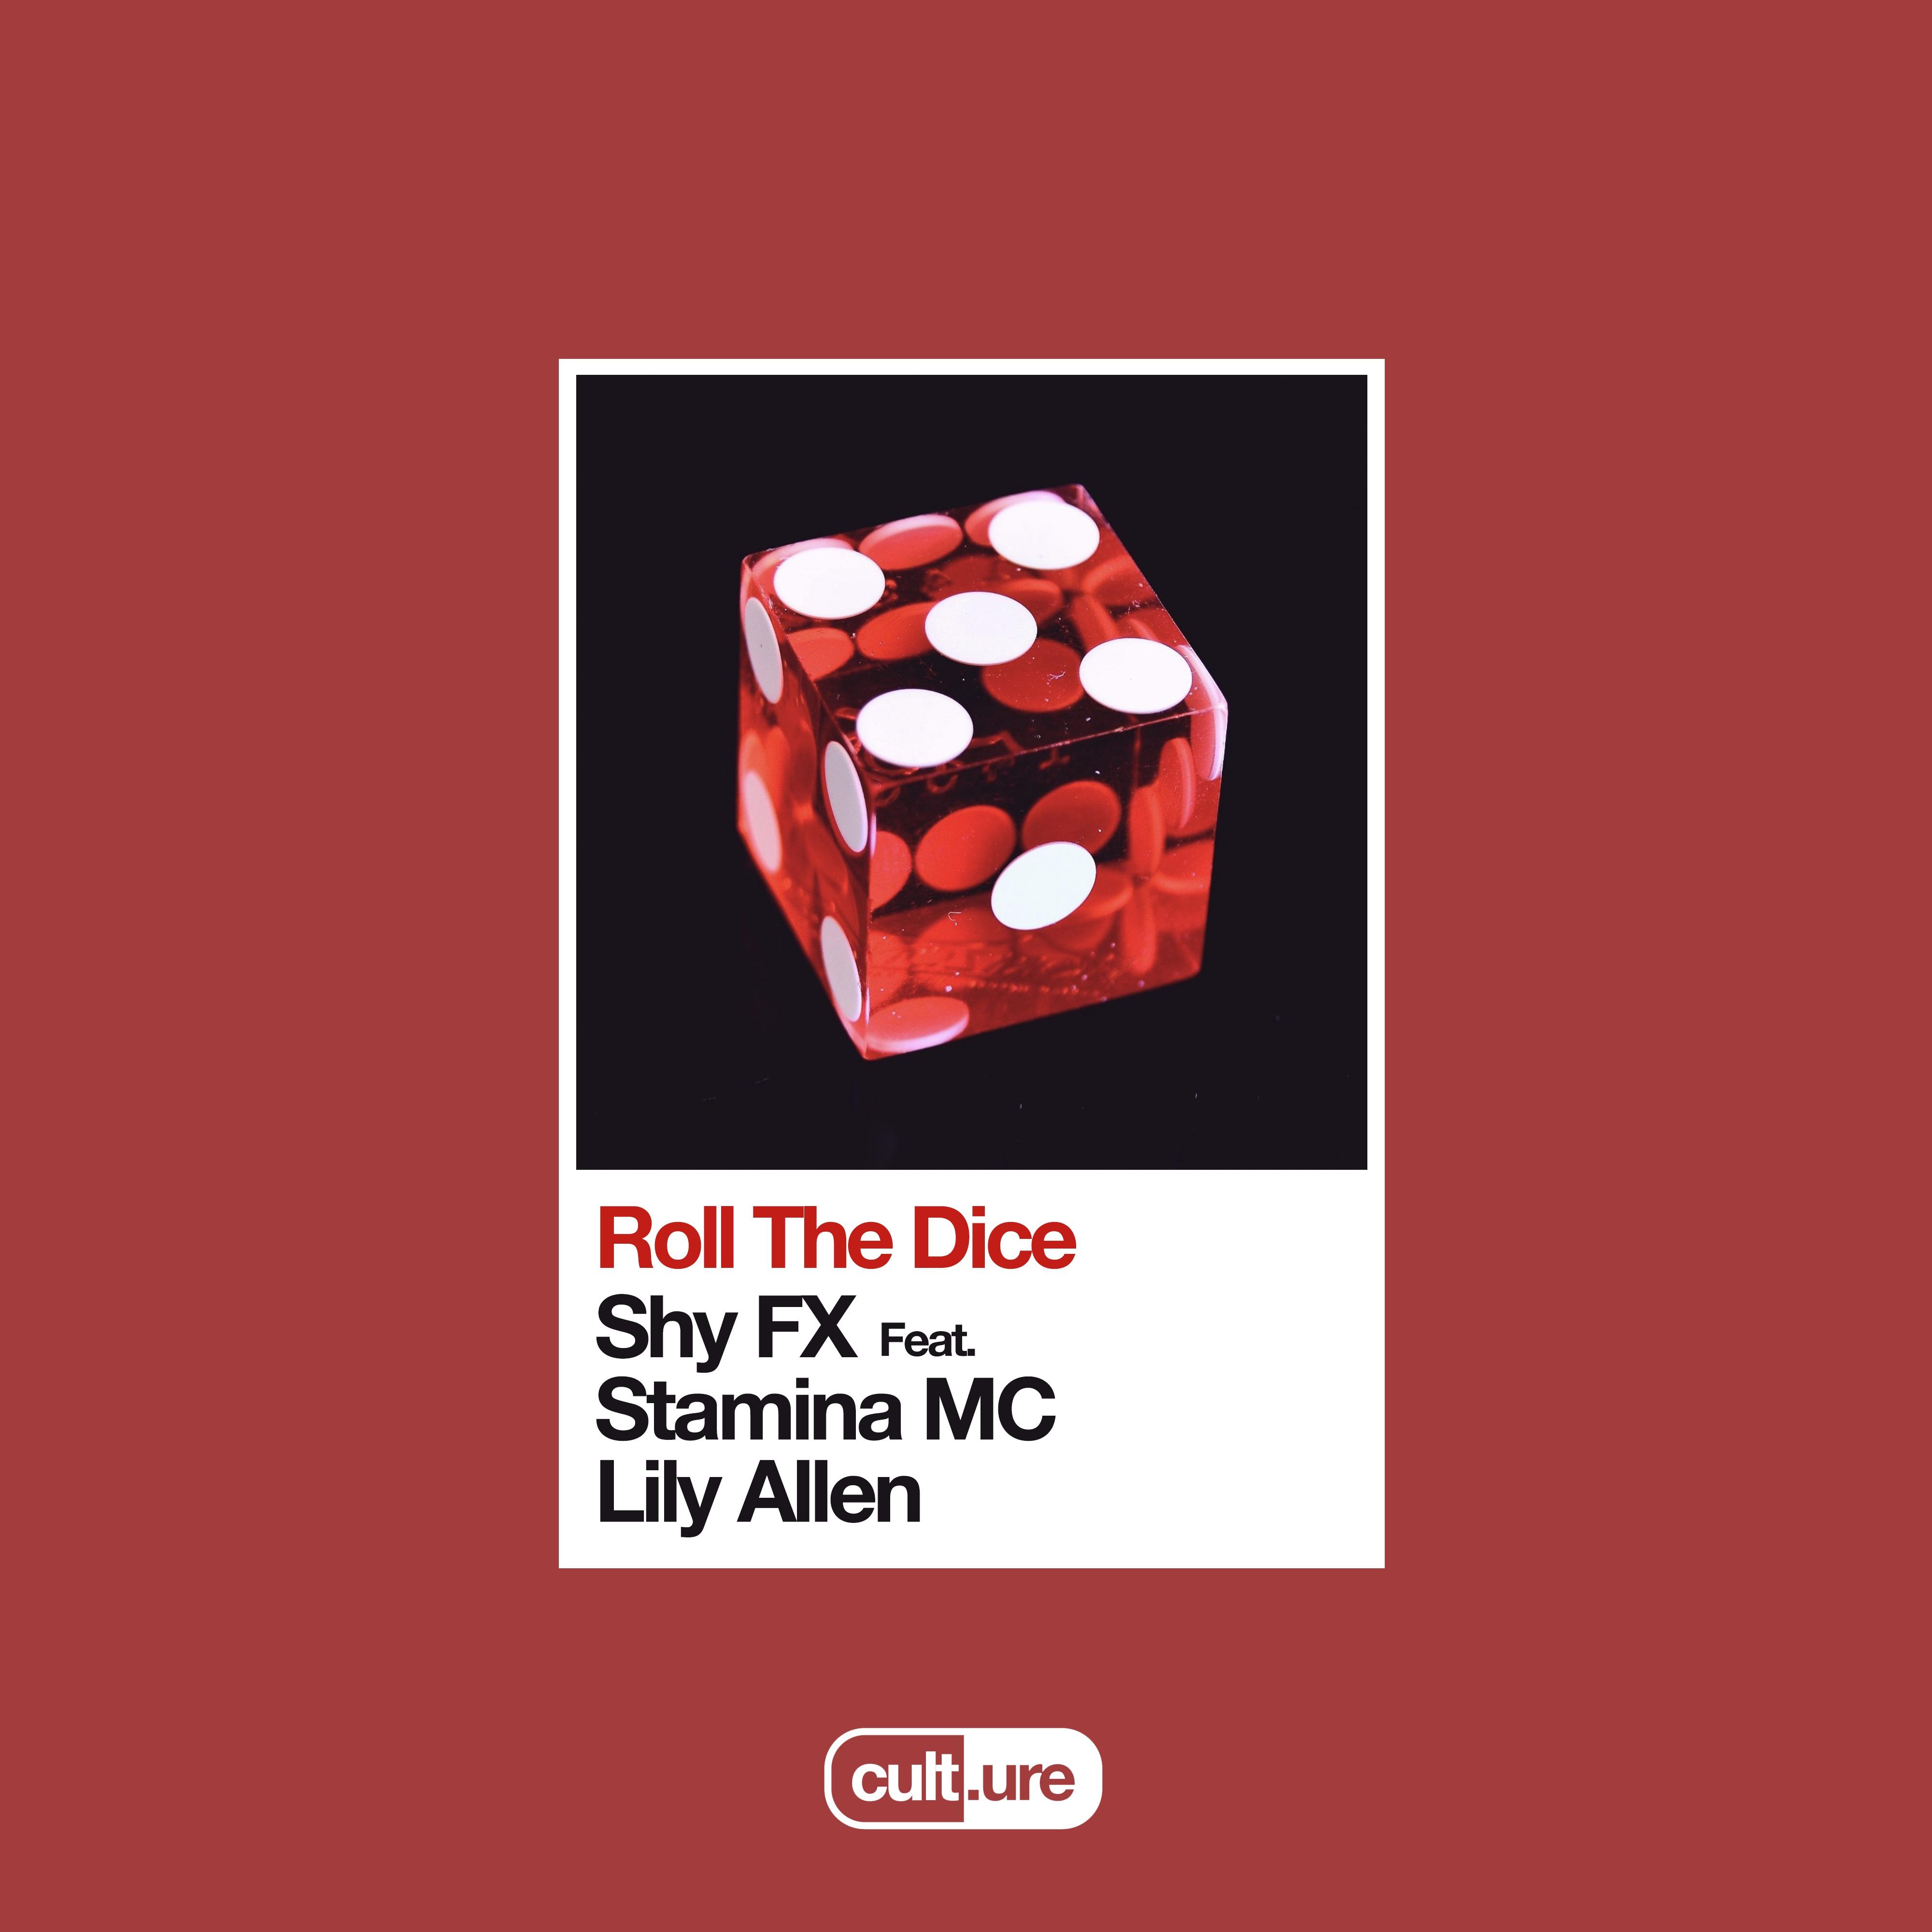 roll_the_dice_artwork.jpg